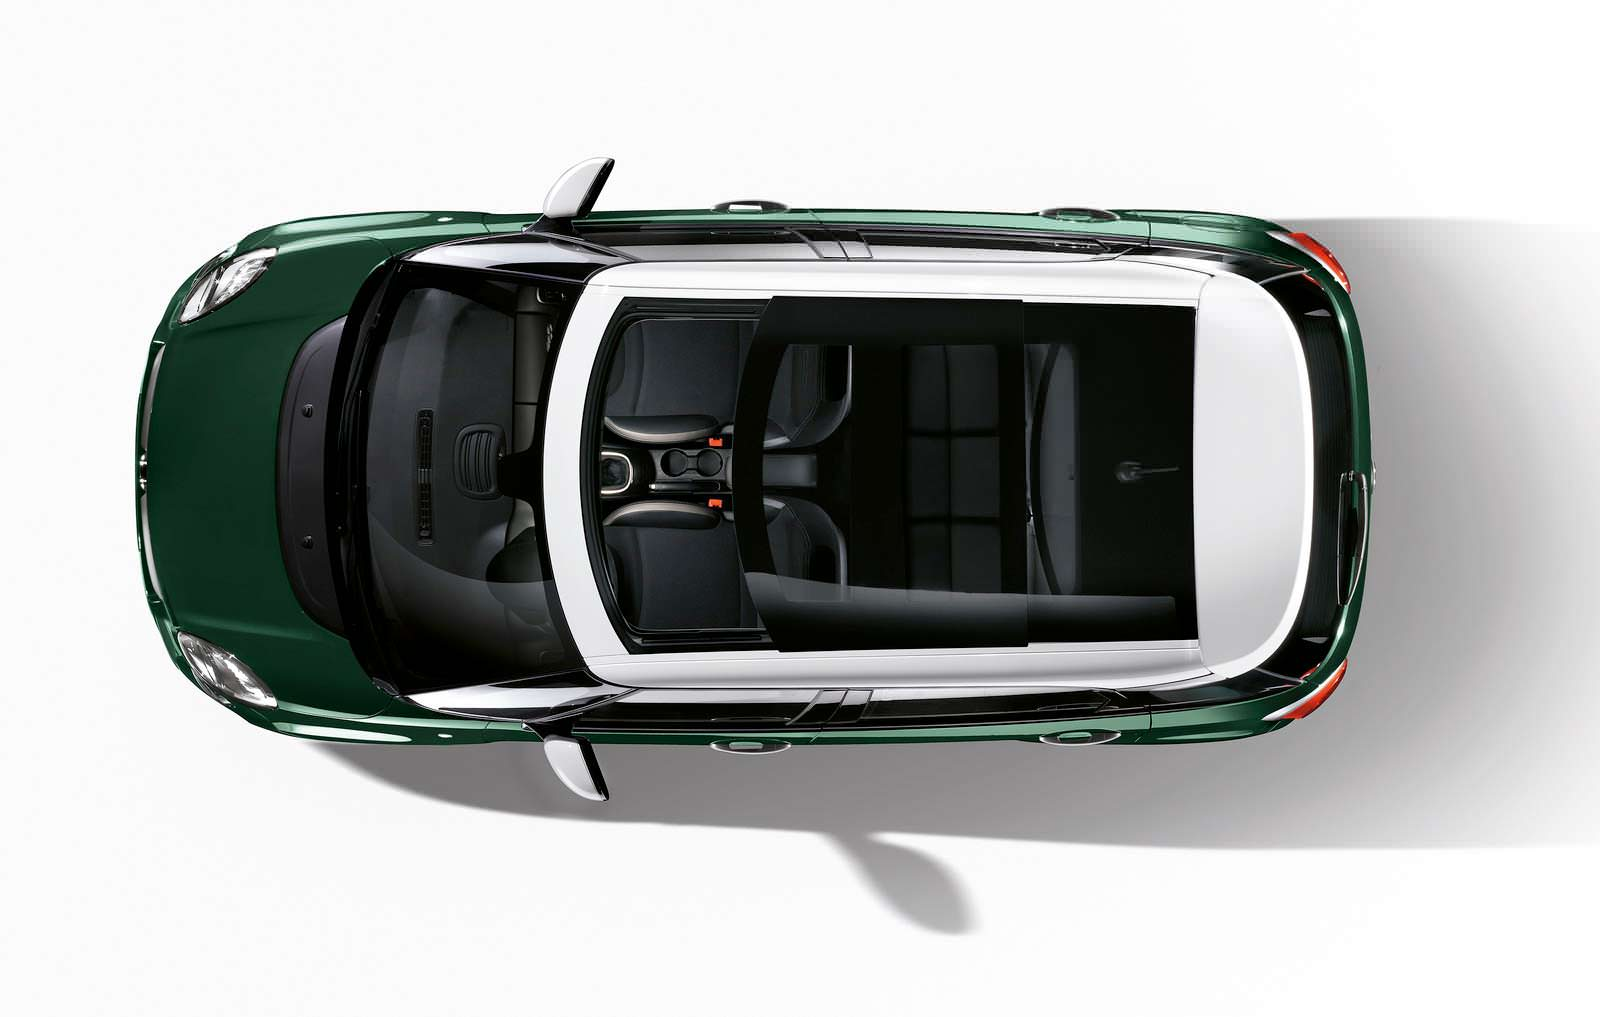 Стеклянная крыша Fiat 500L